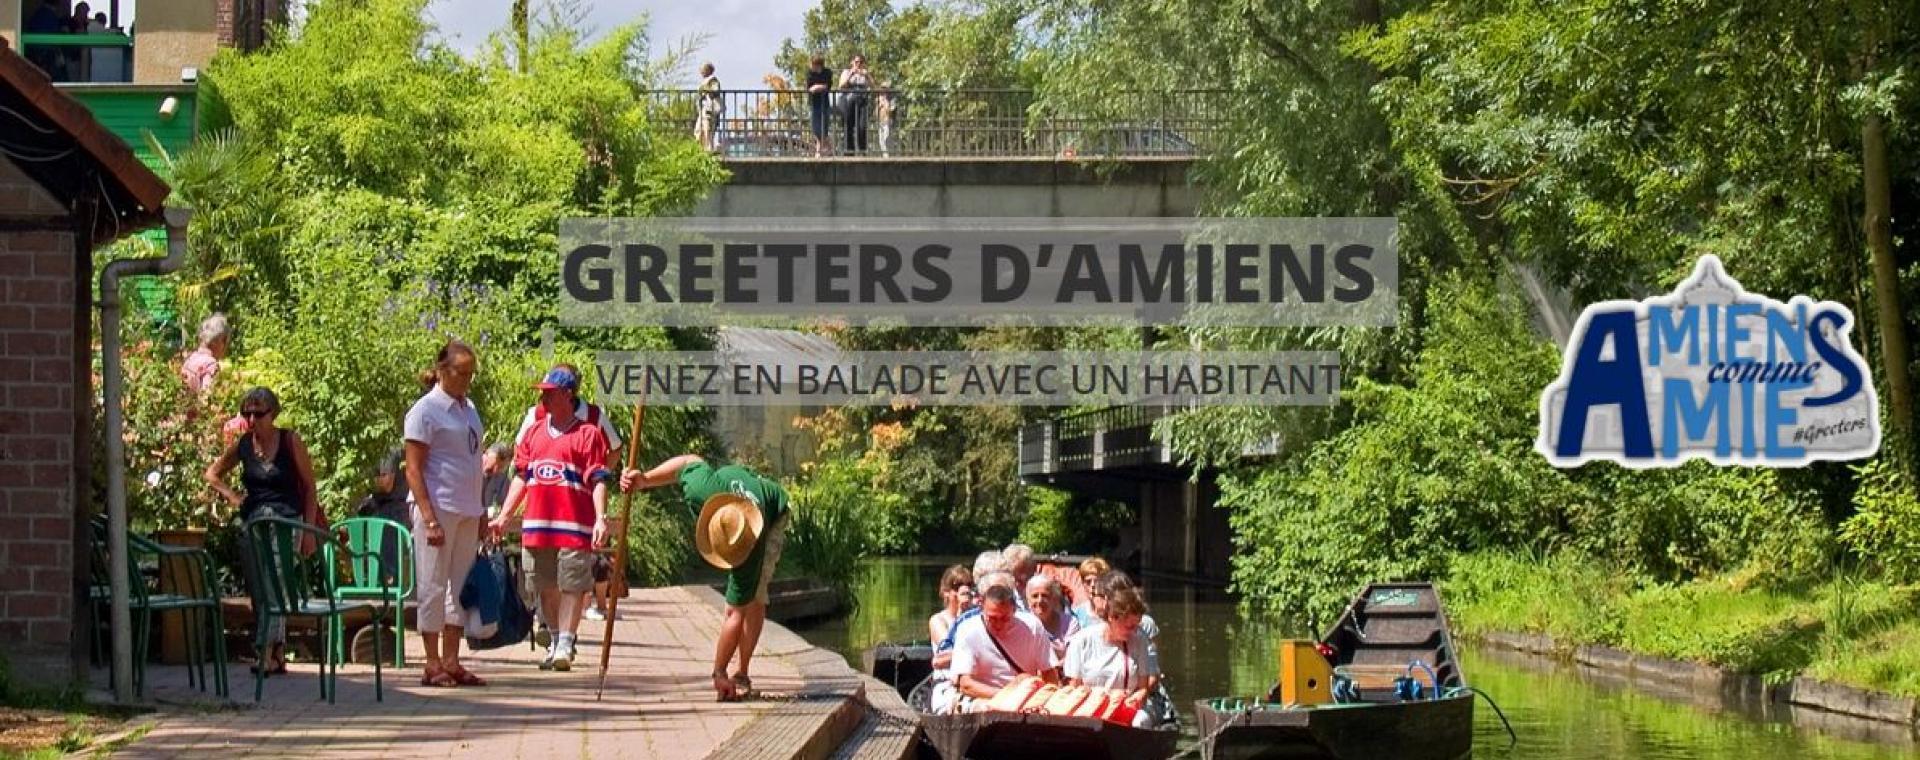 Greeters d'Amiens